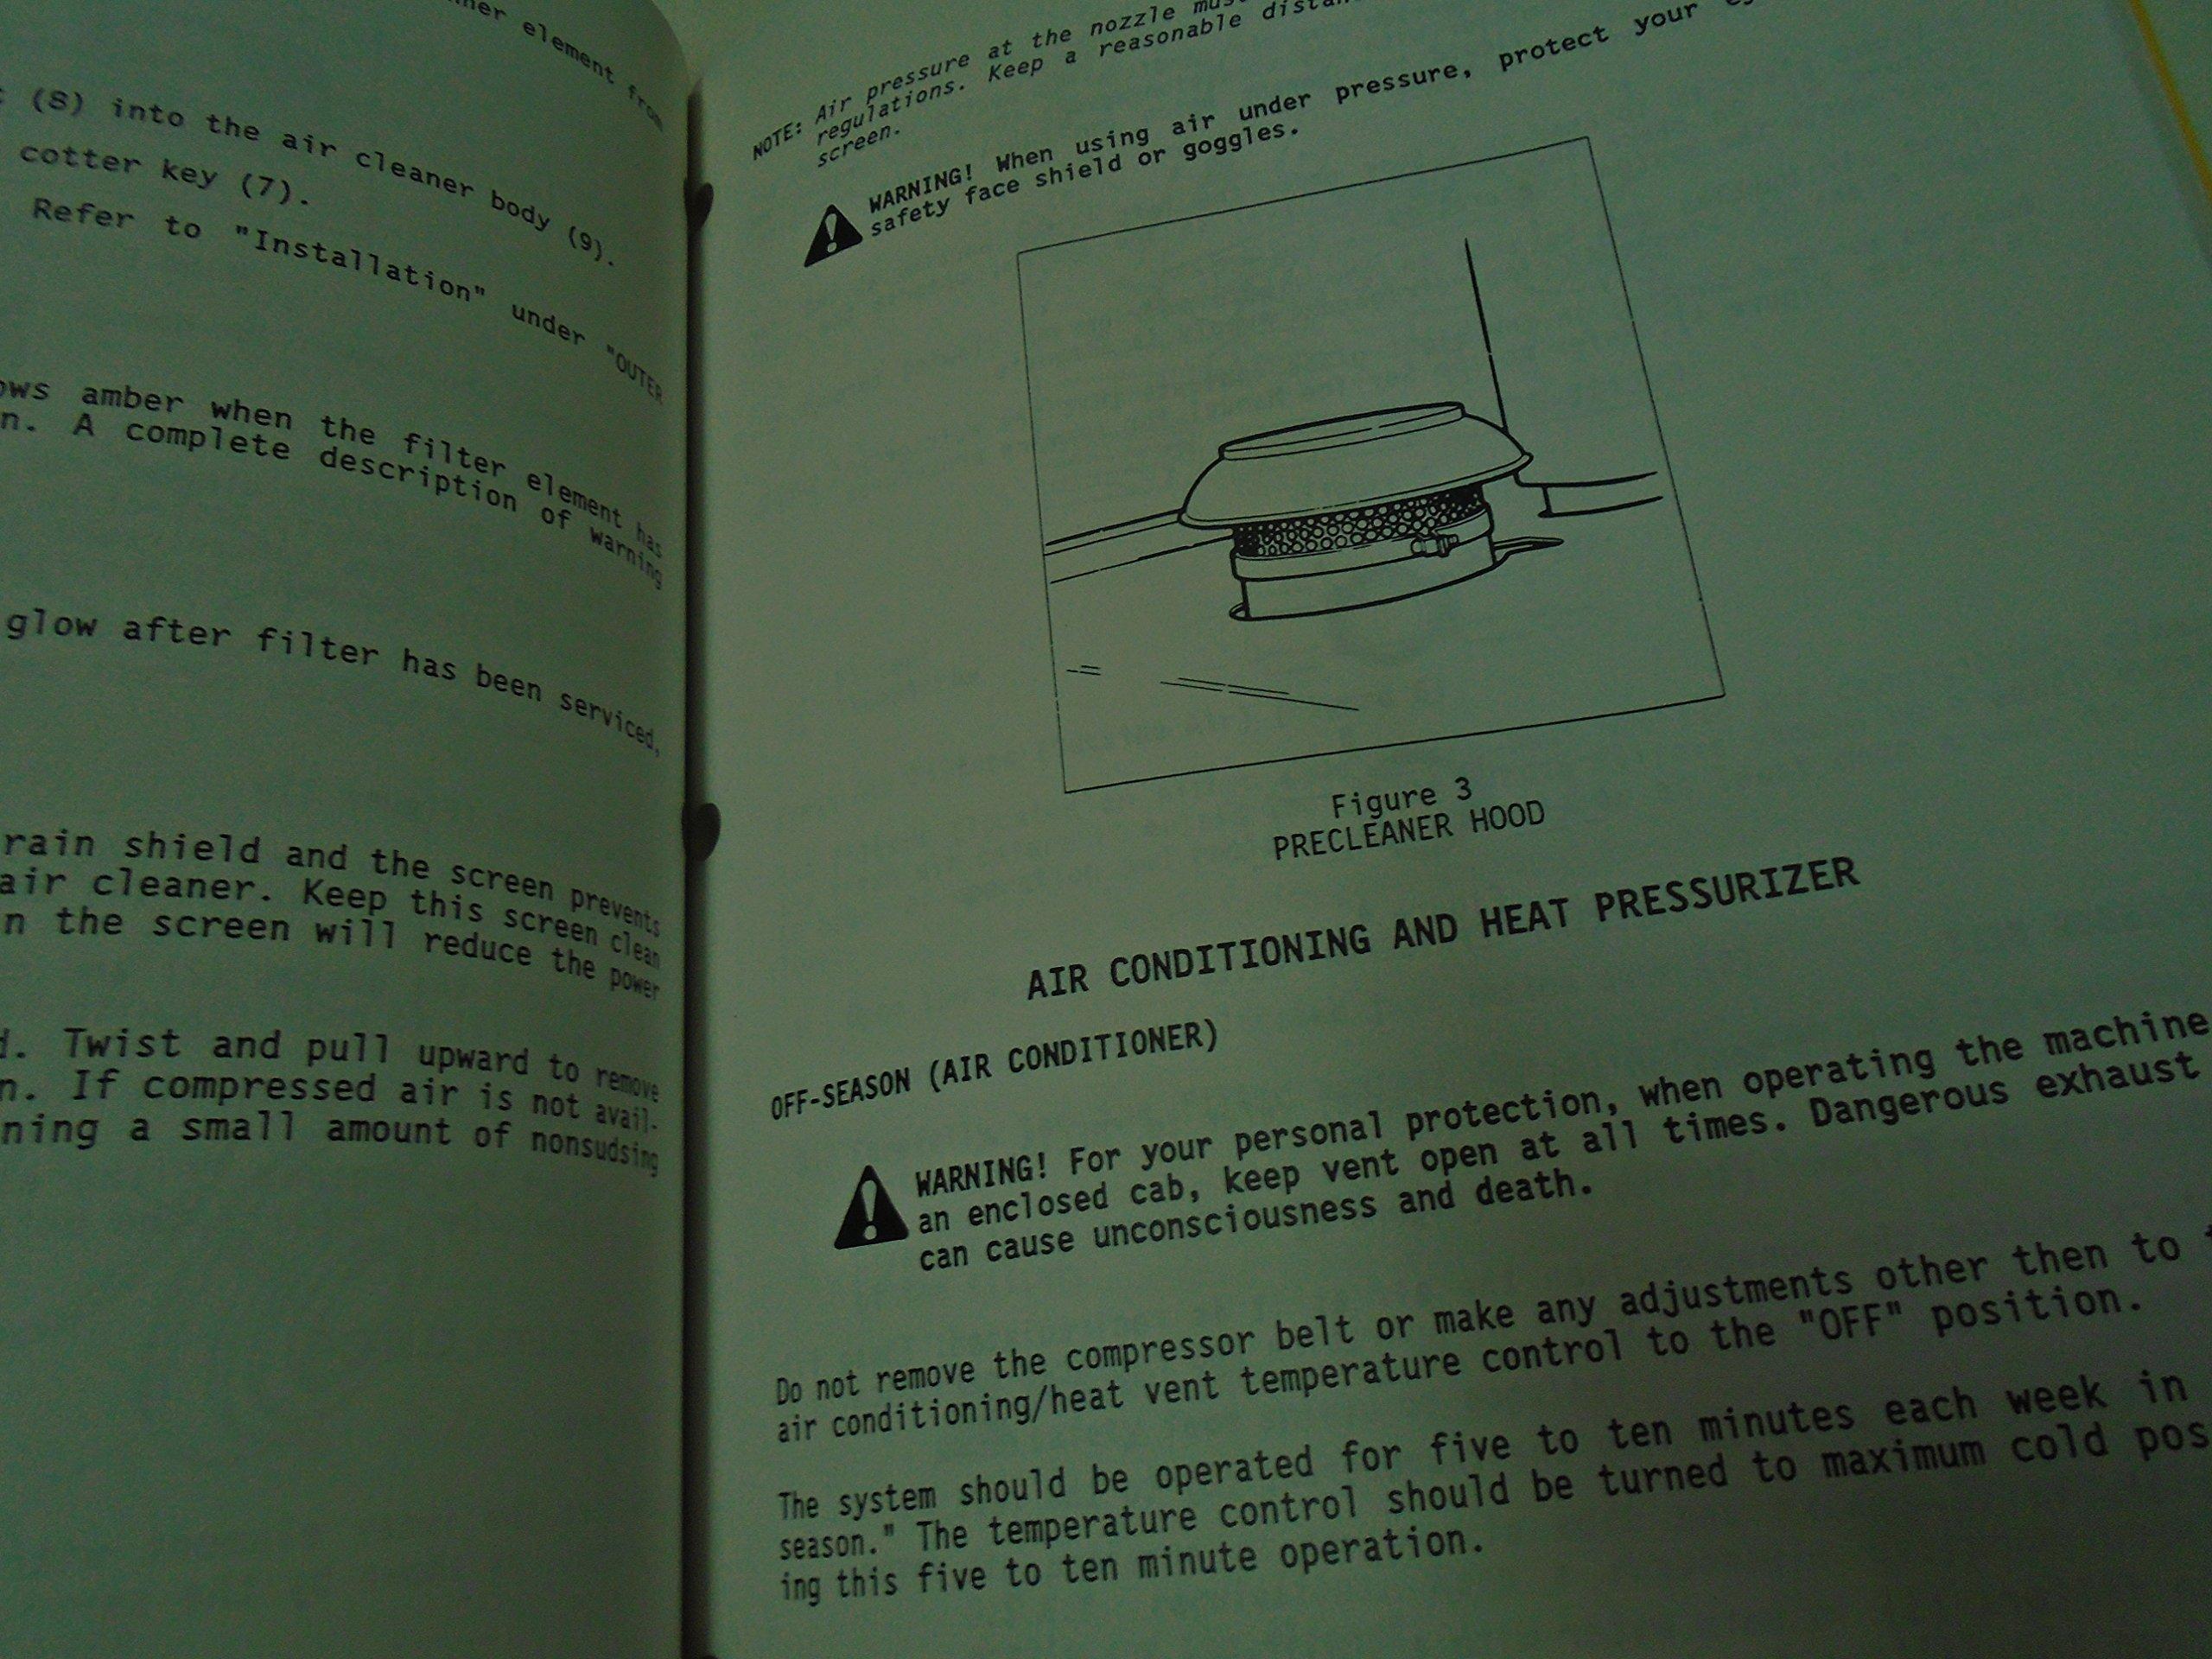 dresser td 7 manual ebook